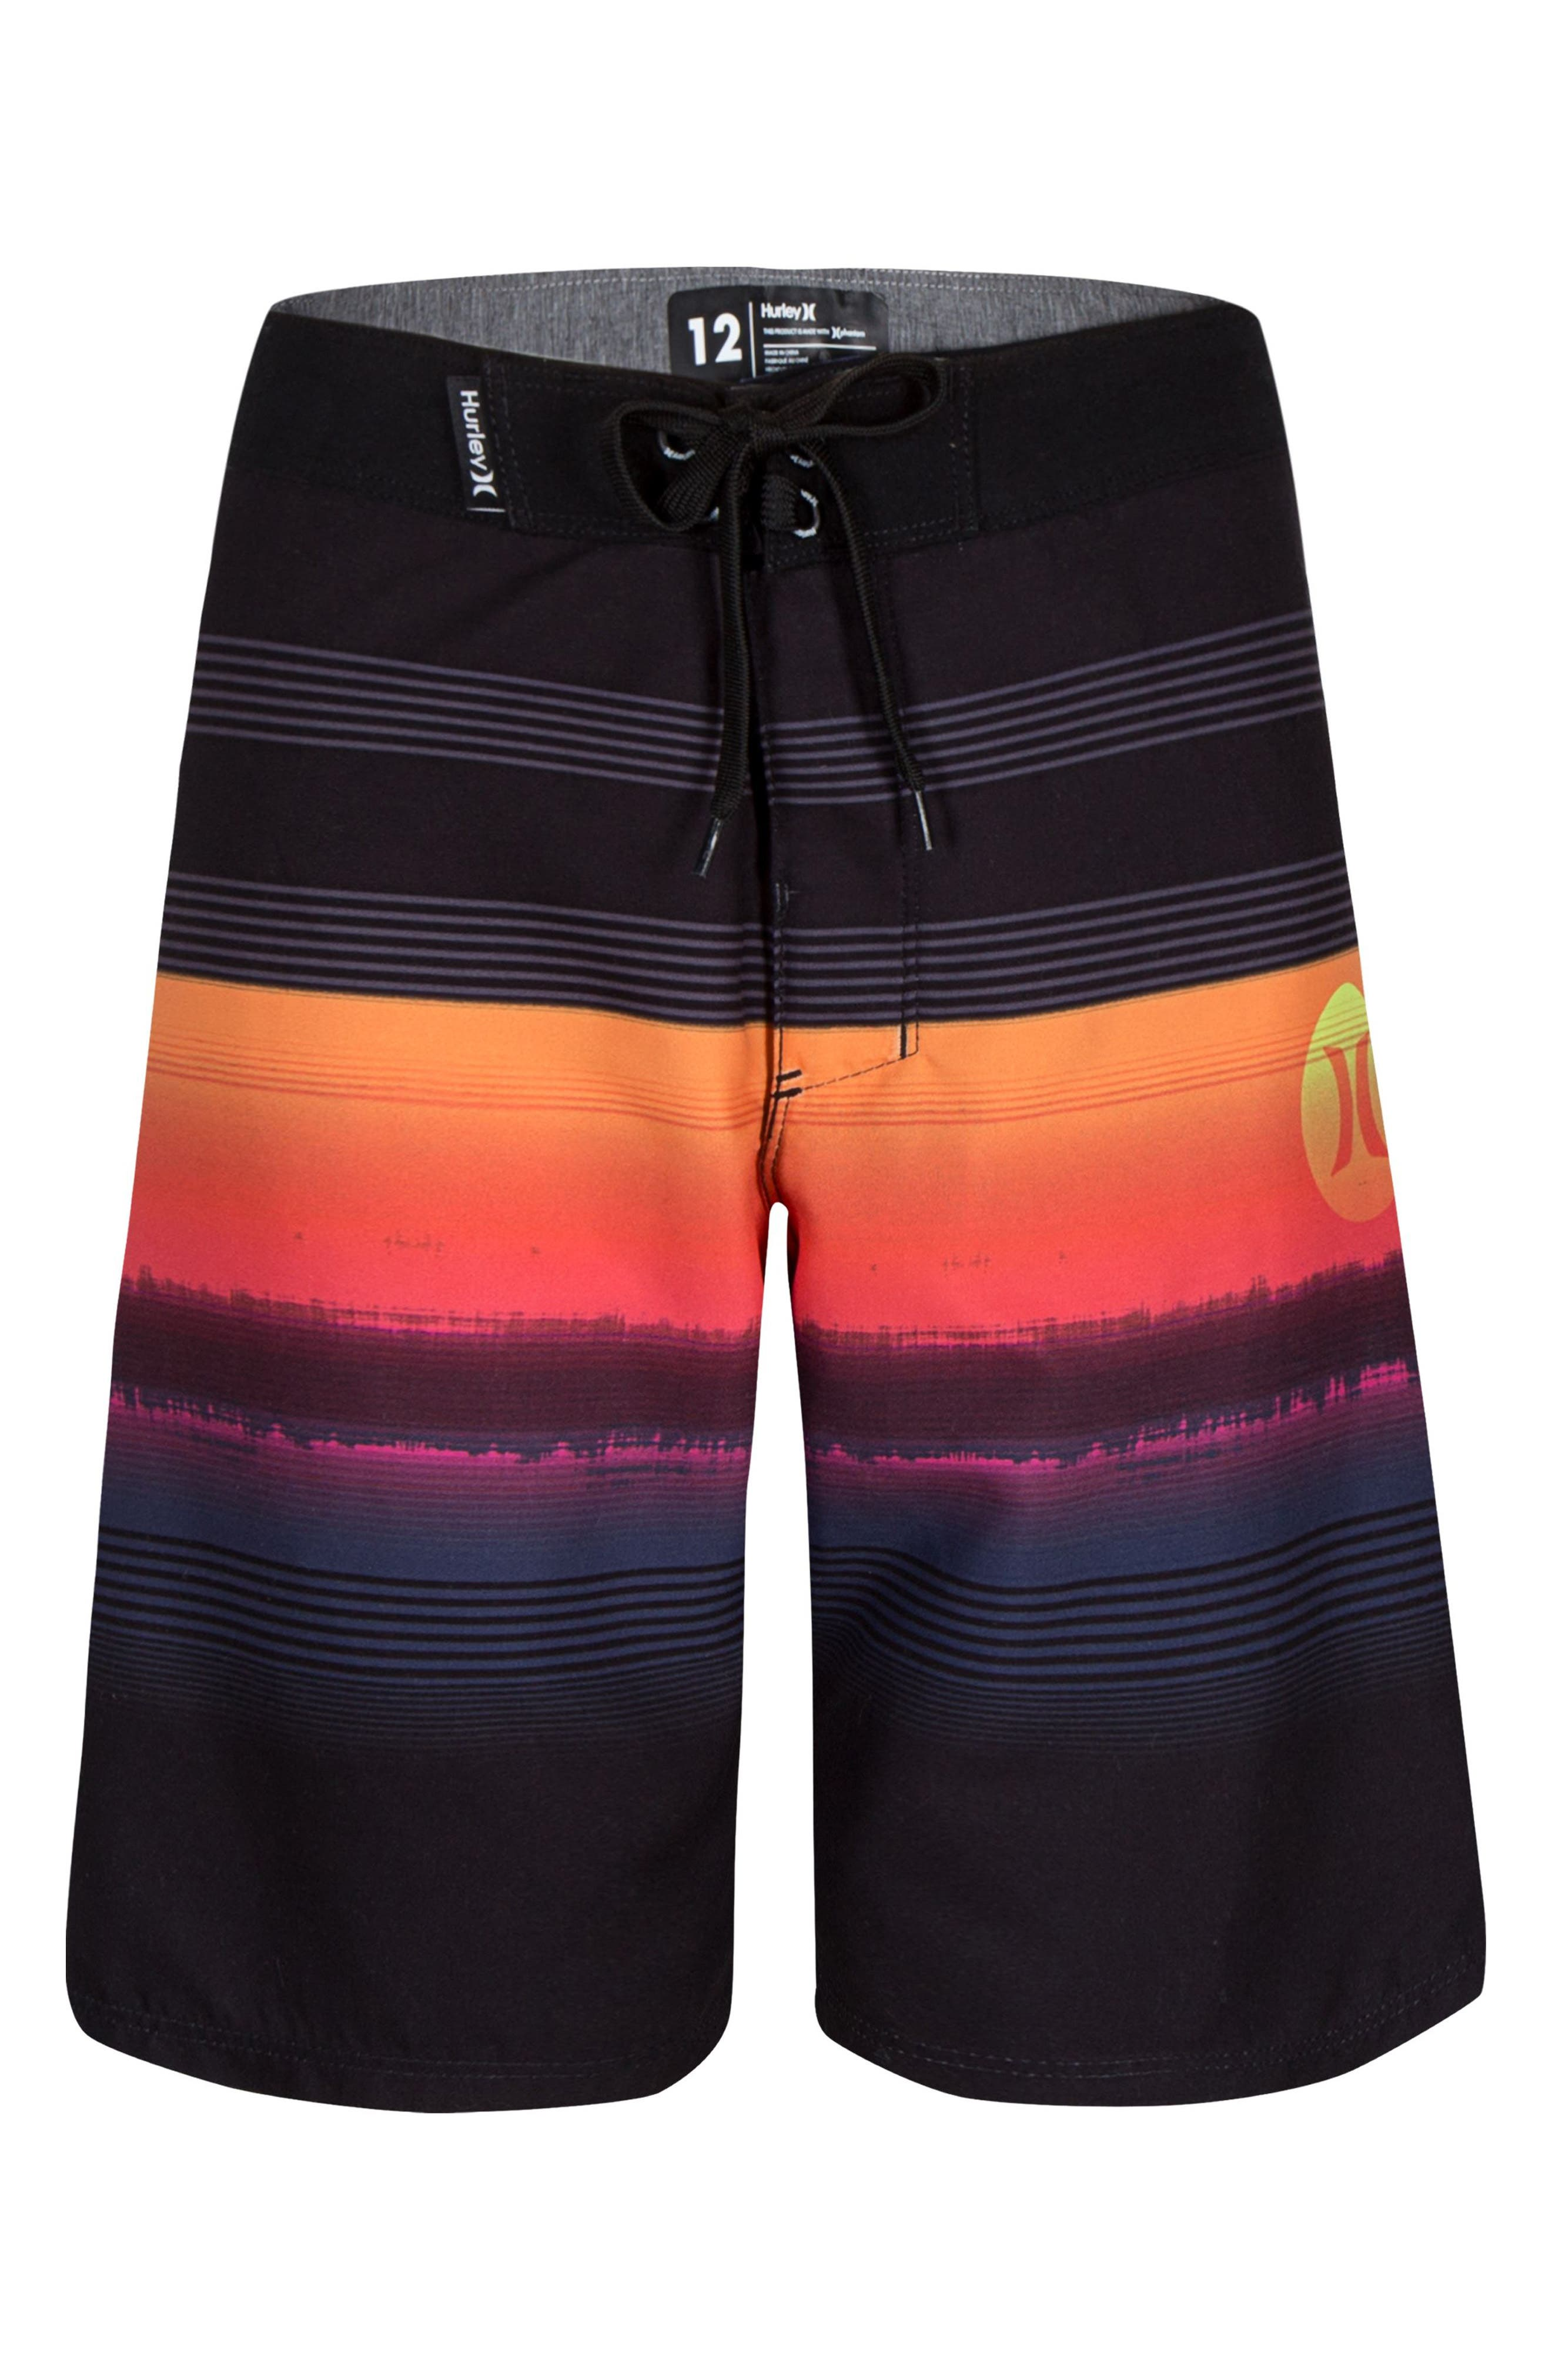 Gavitos Board Shorts,                         Main,                         color, Black